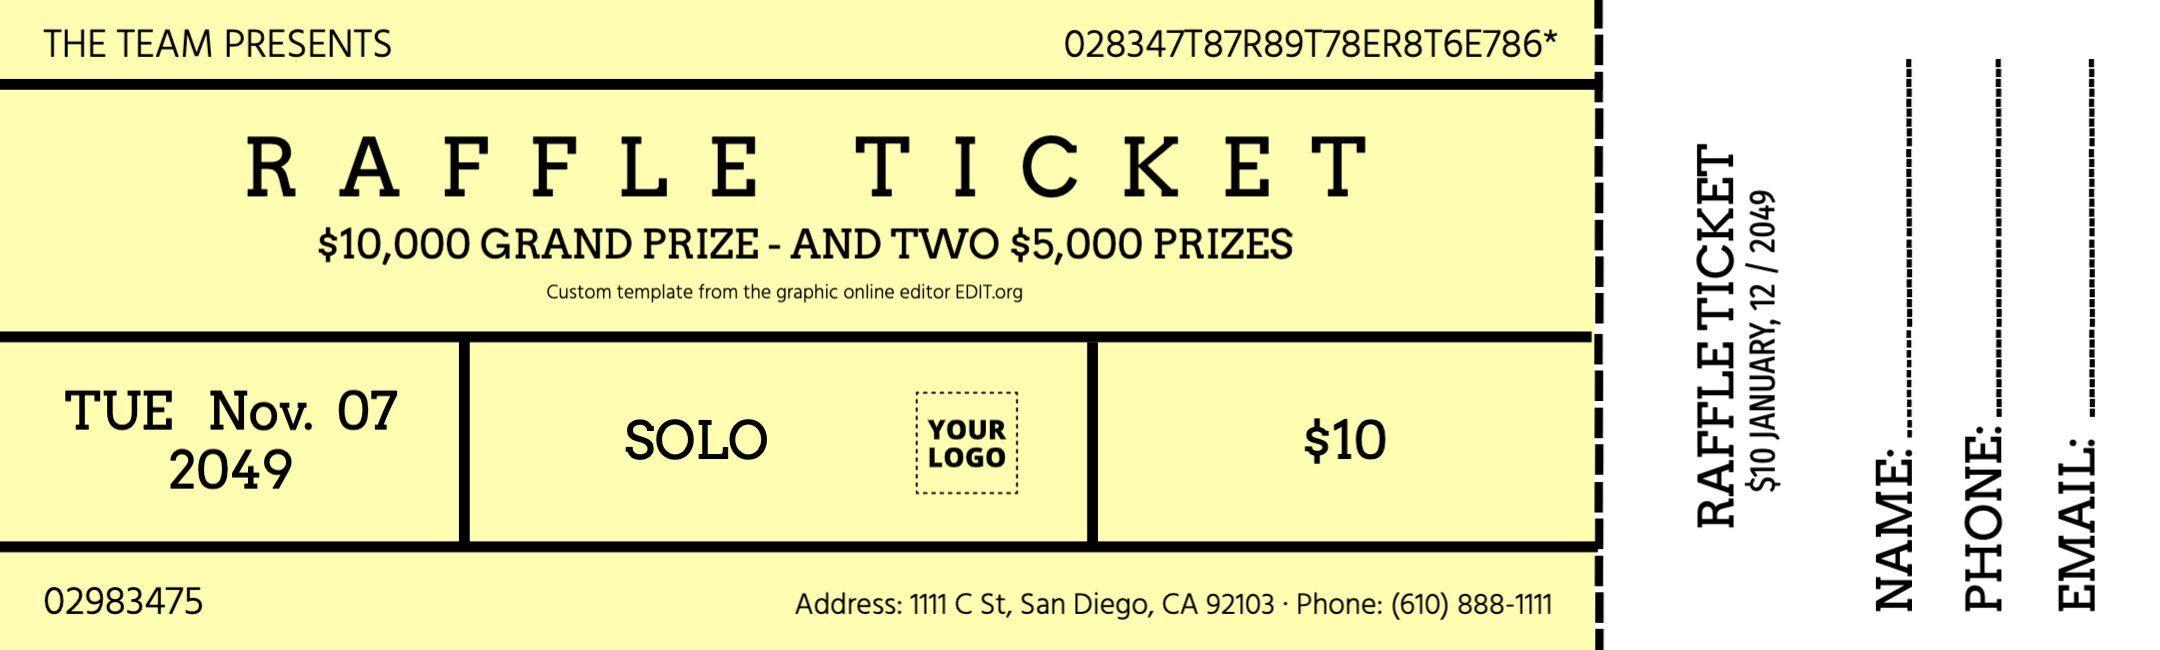 Raffle Ticket To Customize Online Raffle Tickets Raffle Tickets Template Raffle Tickets Printable Two part raffle tickets template